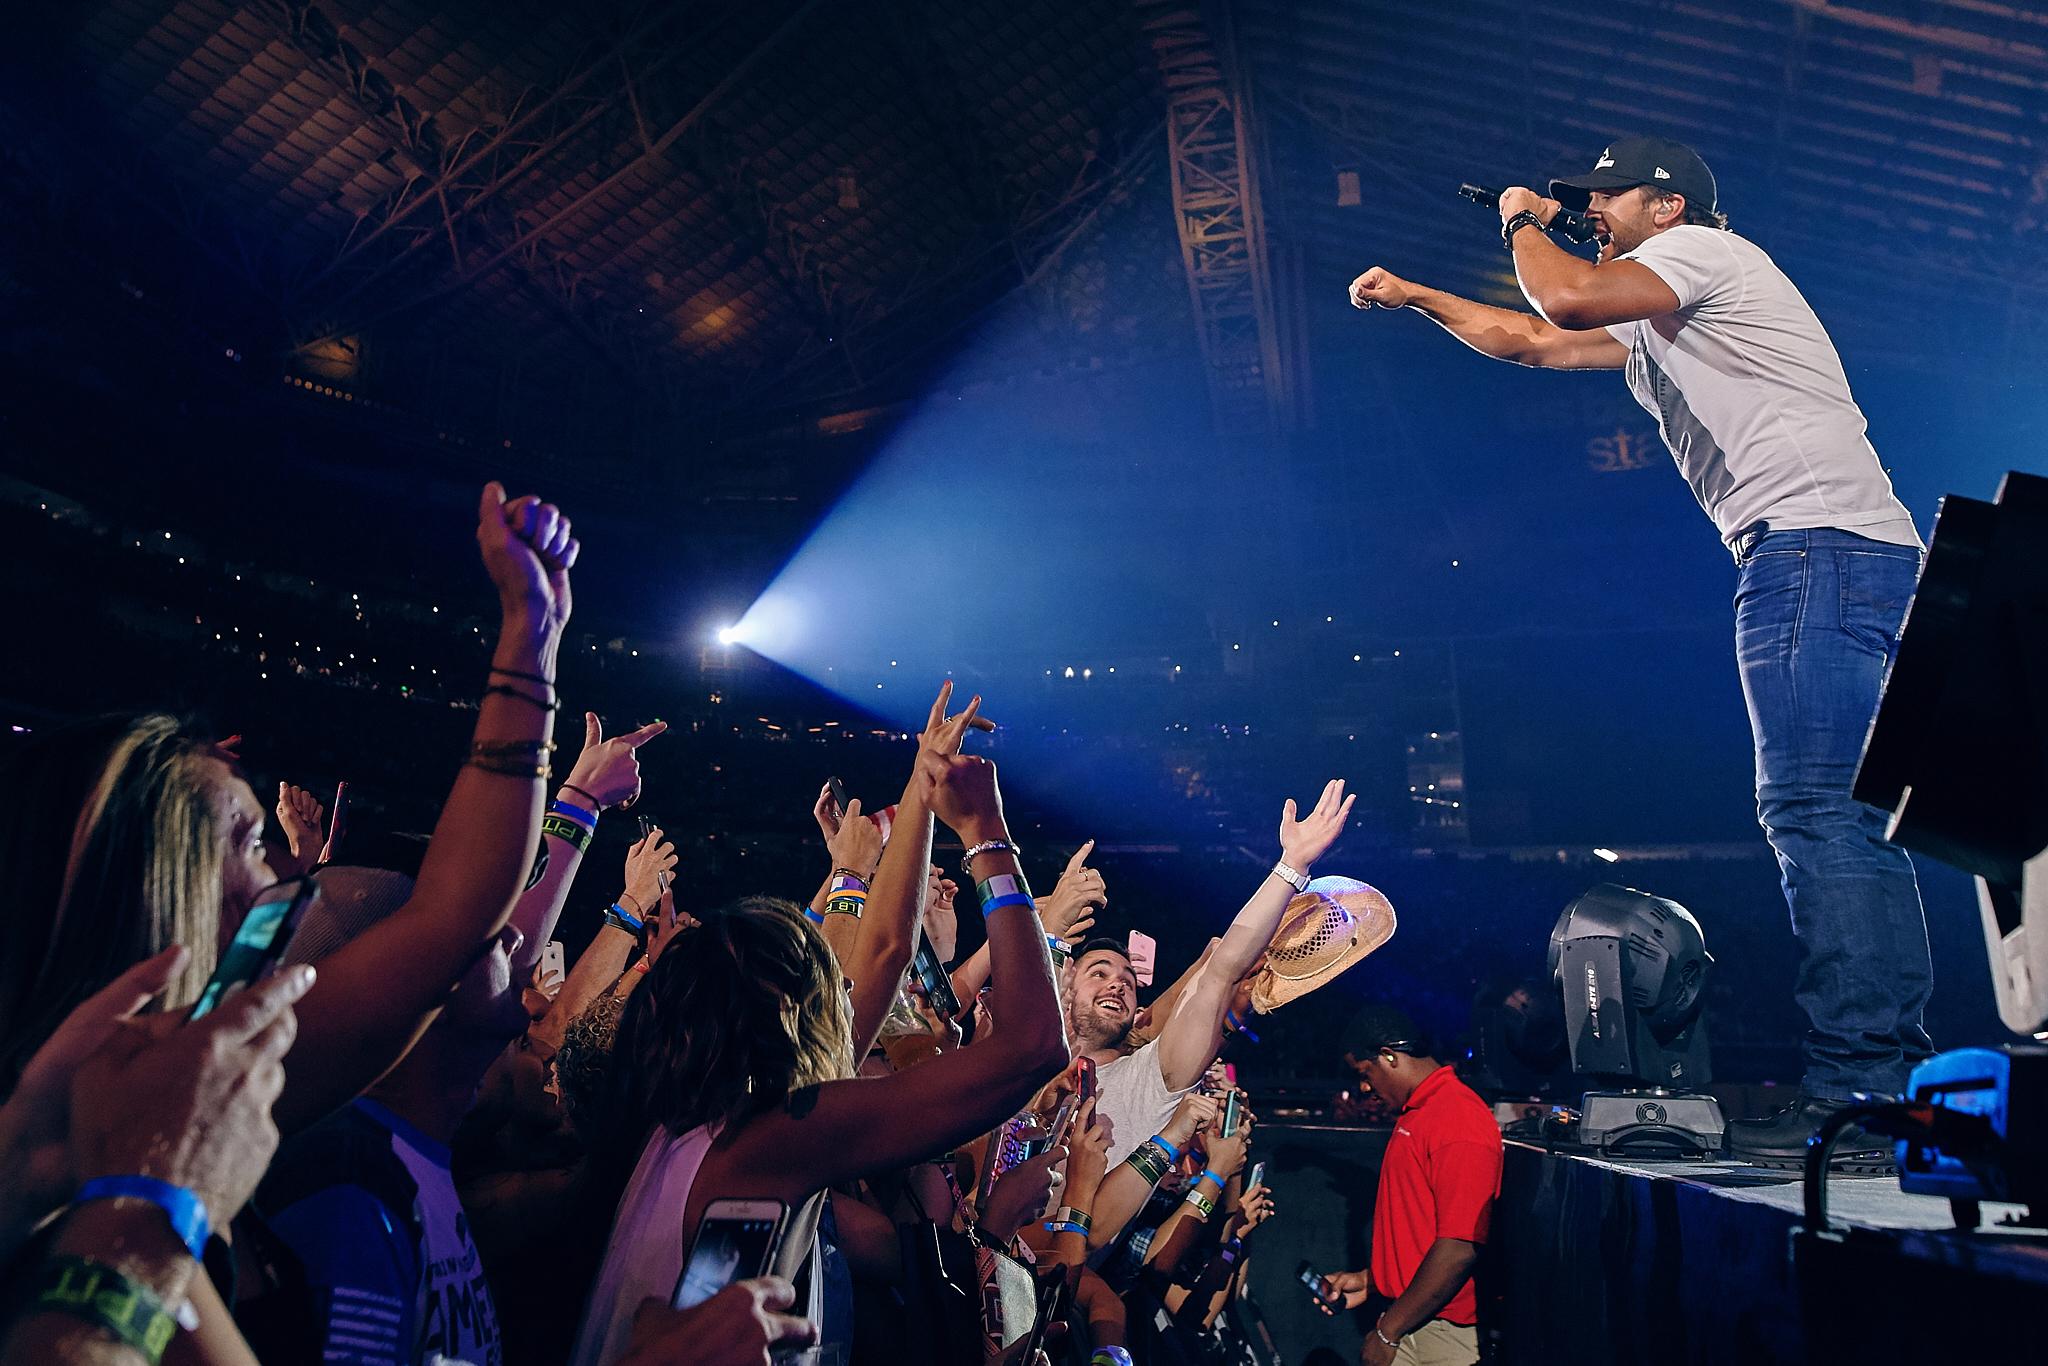 First_Concert_Luke_Bryan_US_Bank_Stadium_Minneapolis_Minnesota_Photography_By_Joe_Lemke_012.JPG